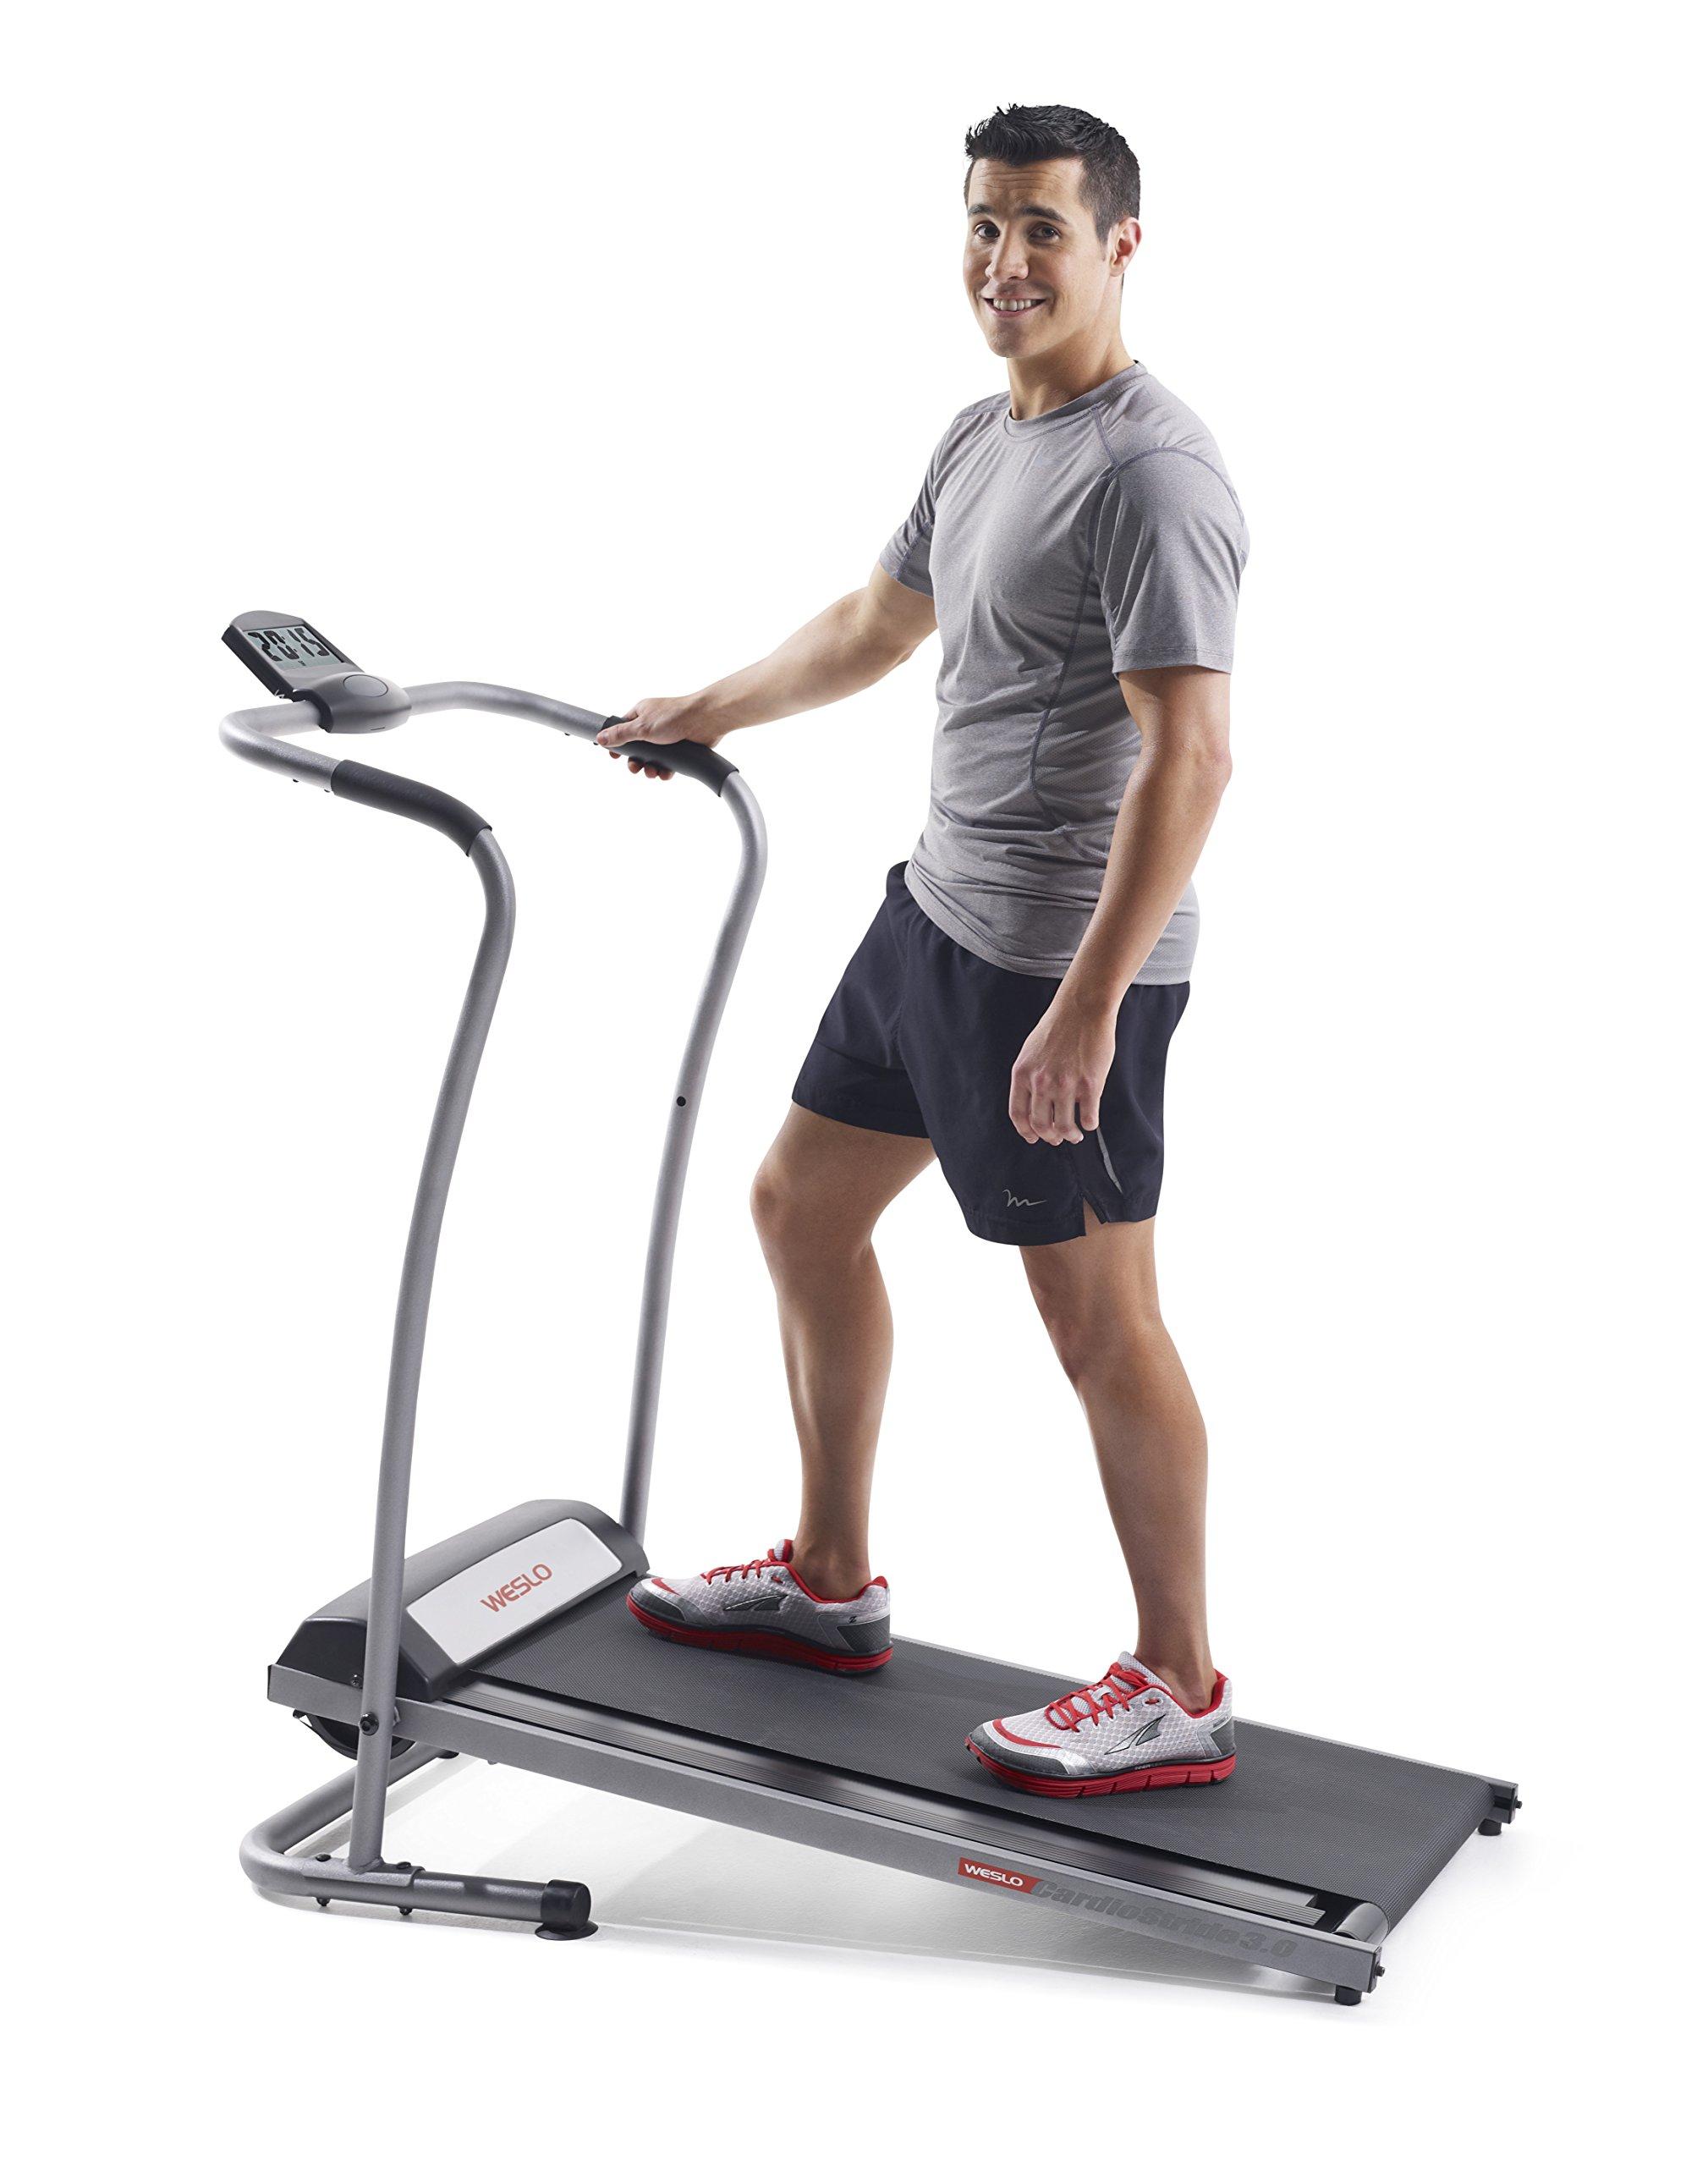 Weslo WLTL99315 CardioStride 3.0 Treadmill by Weslo (Image #7)